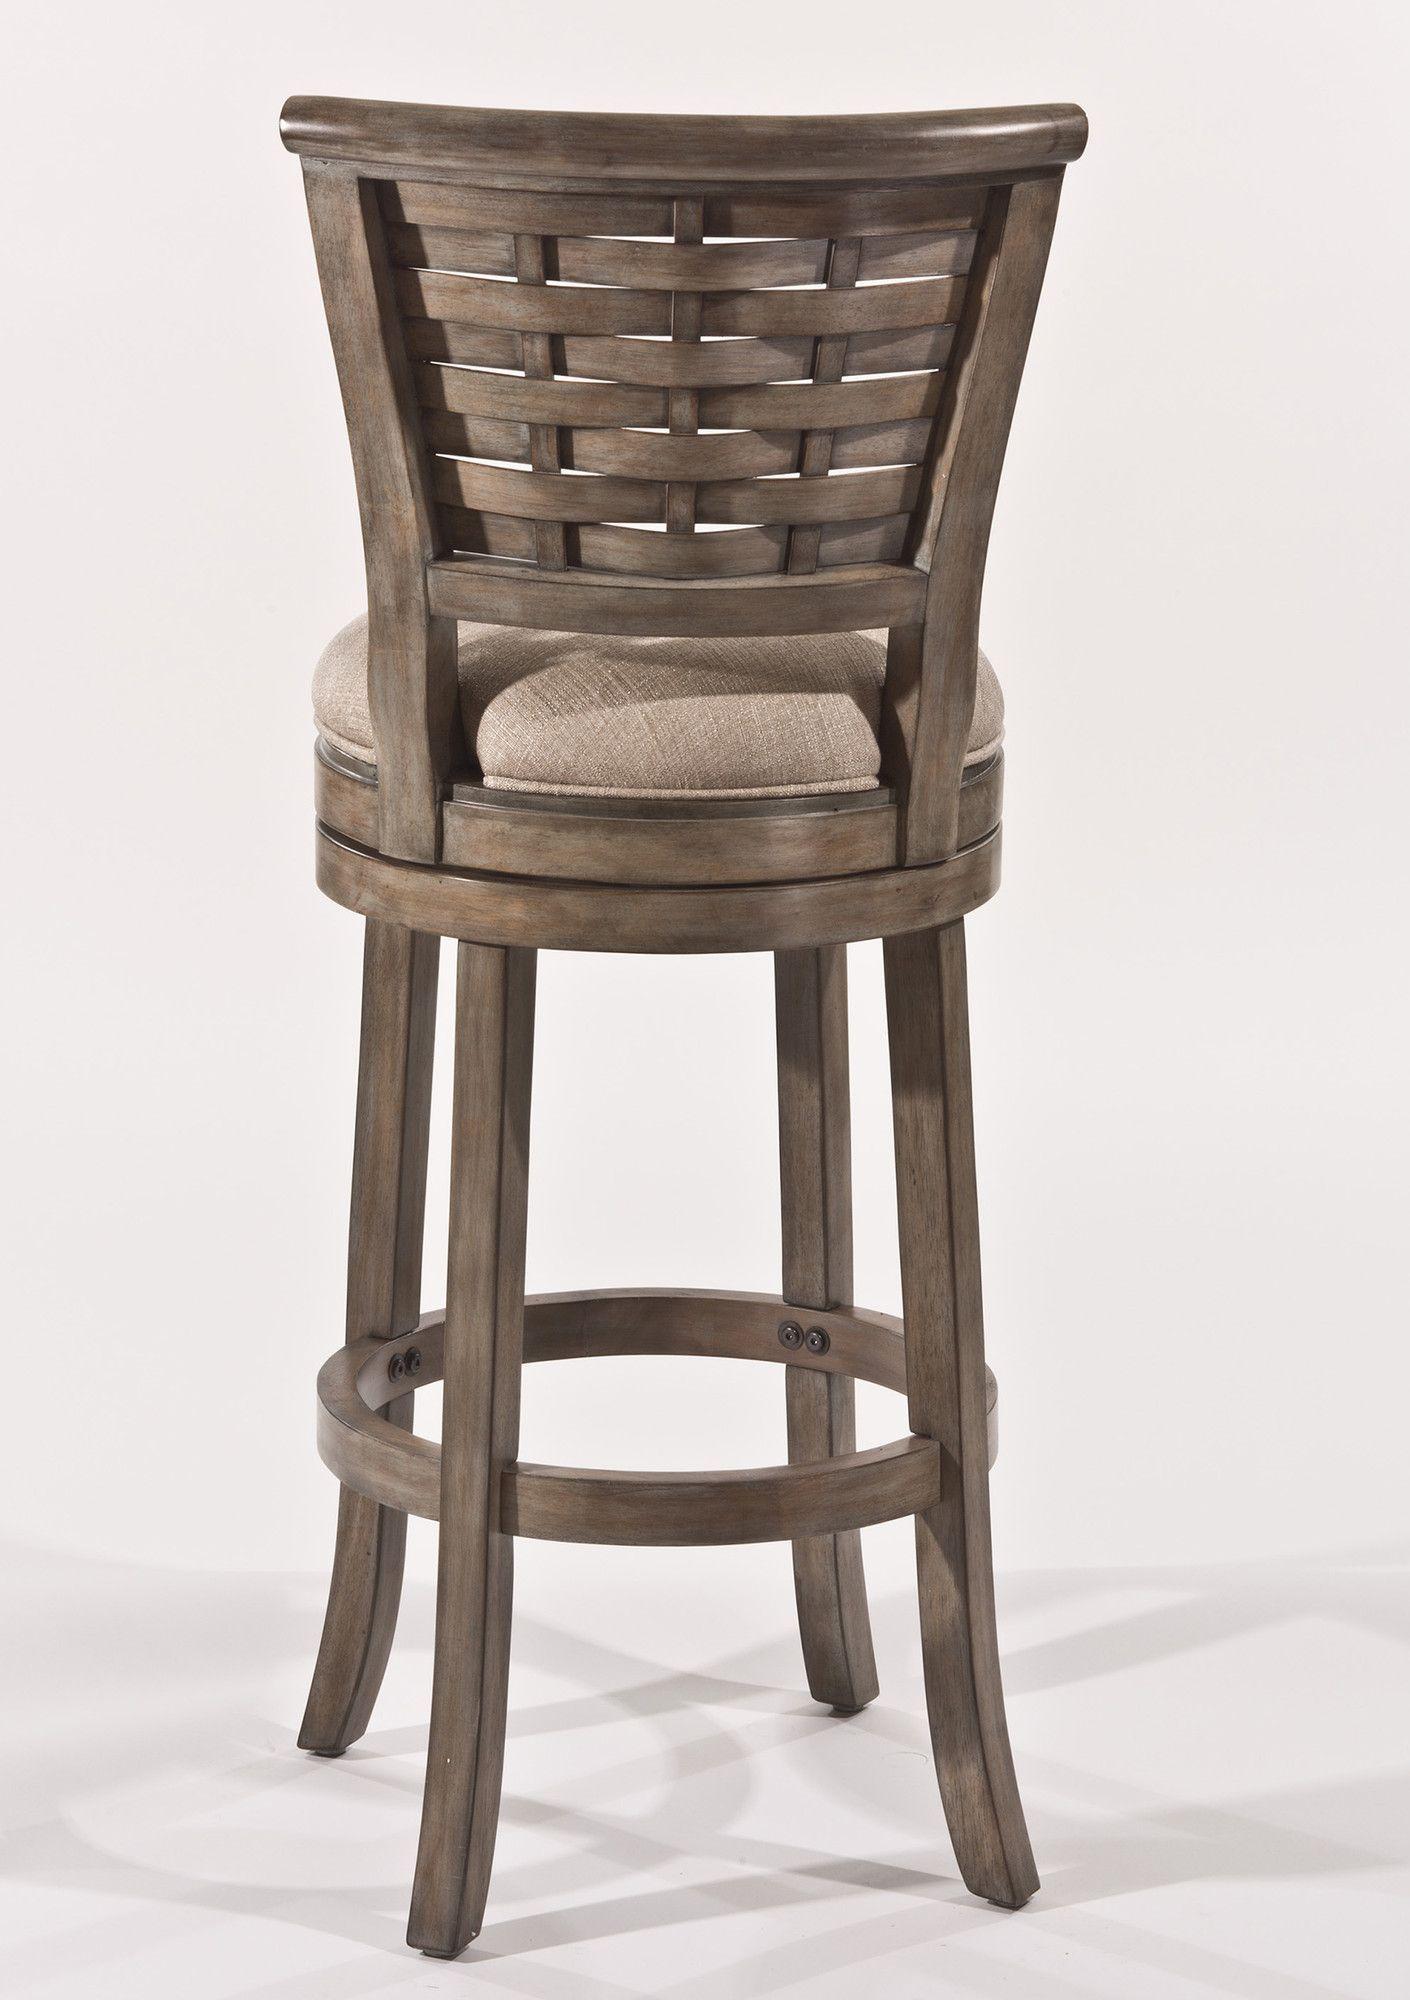 Astounding Joss And Main Designs For Dp In 2019 Swivel Bar Stools Creativecarmelina Interior Chair Design Creativecarmelinacom